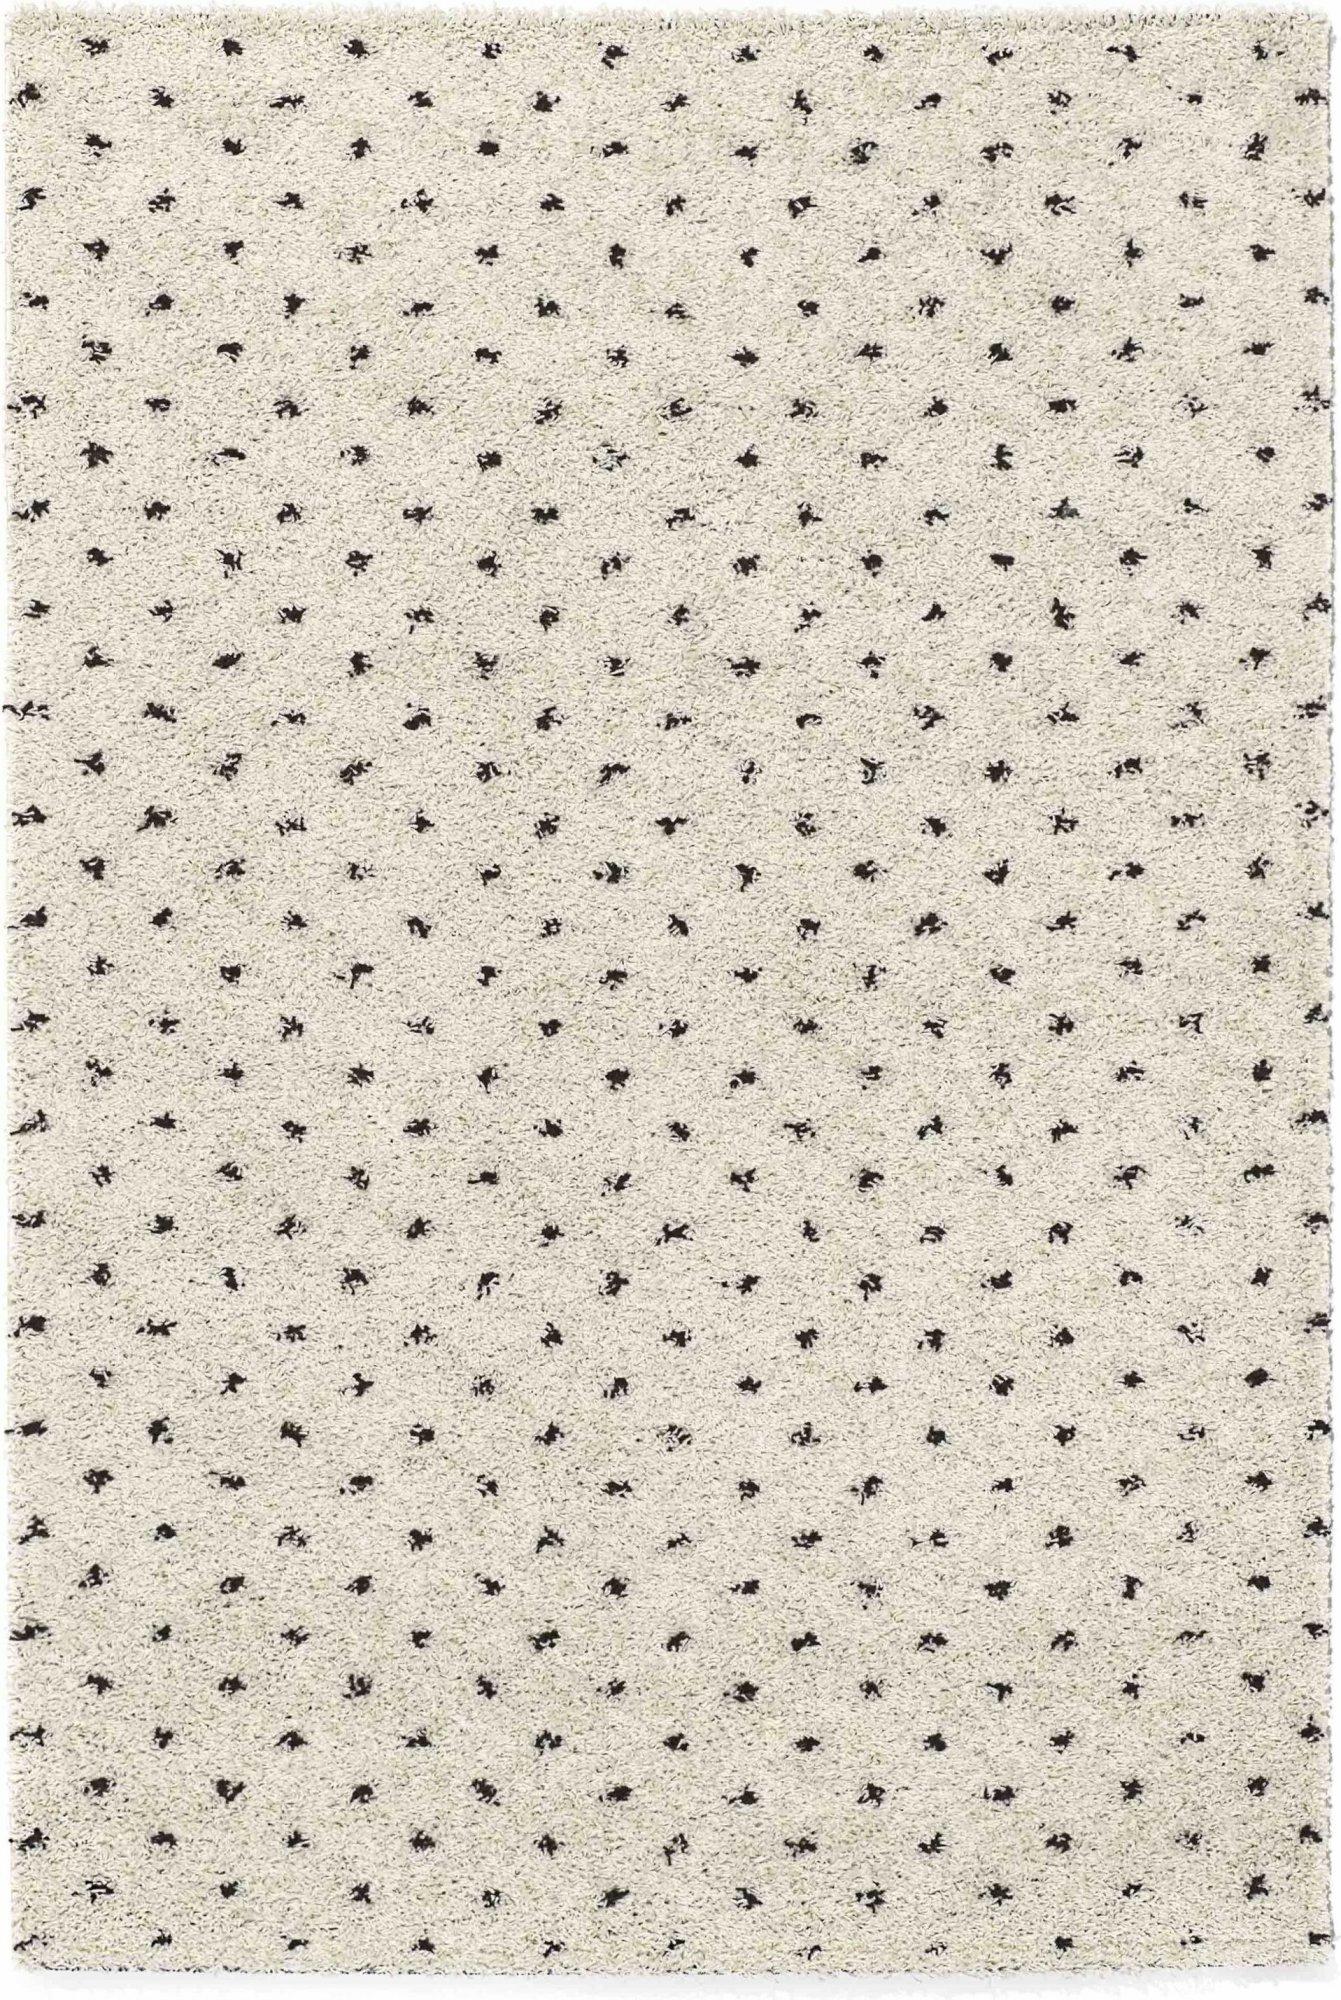 Tapis shaggy polypropylène beige 67x180